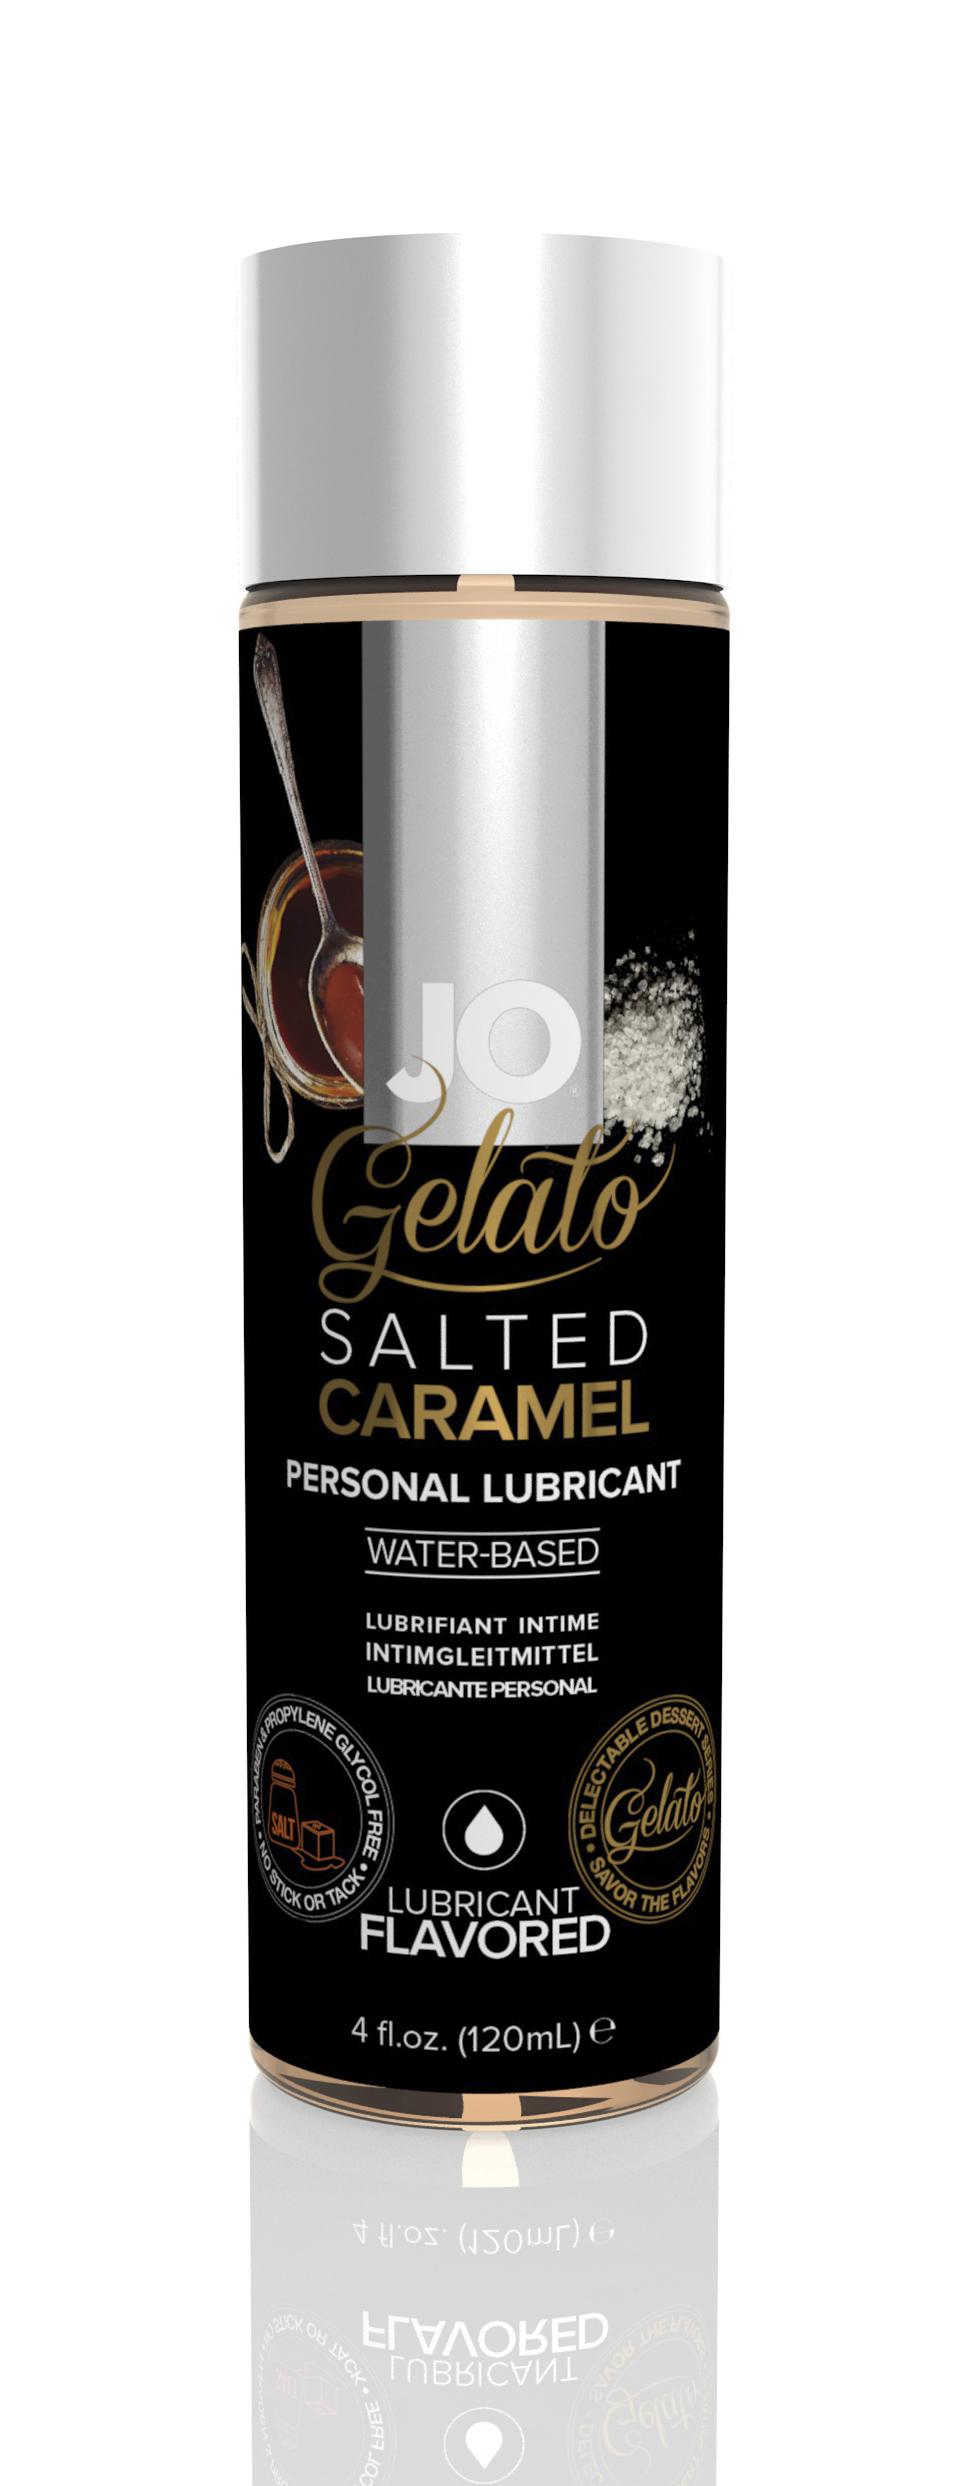 44023 - JO GELATO - SALTED CARAMEL - LUBRICANT (WATER-BASED) 4 floz 120 mL.jpg